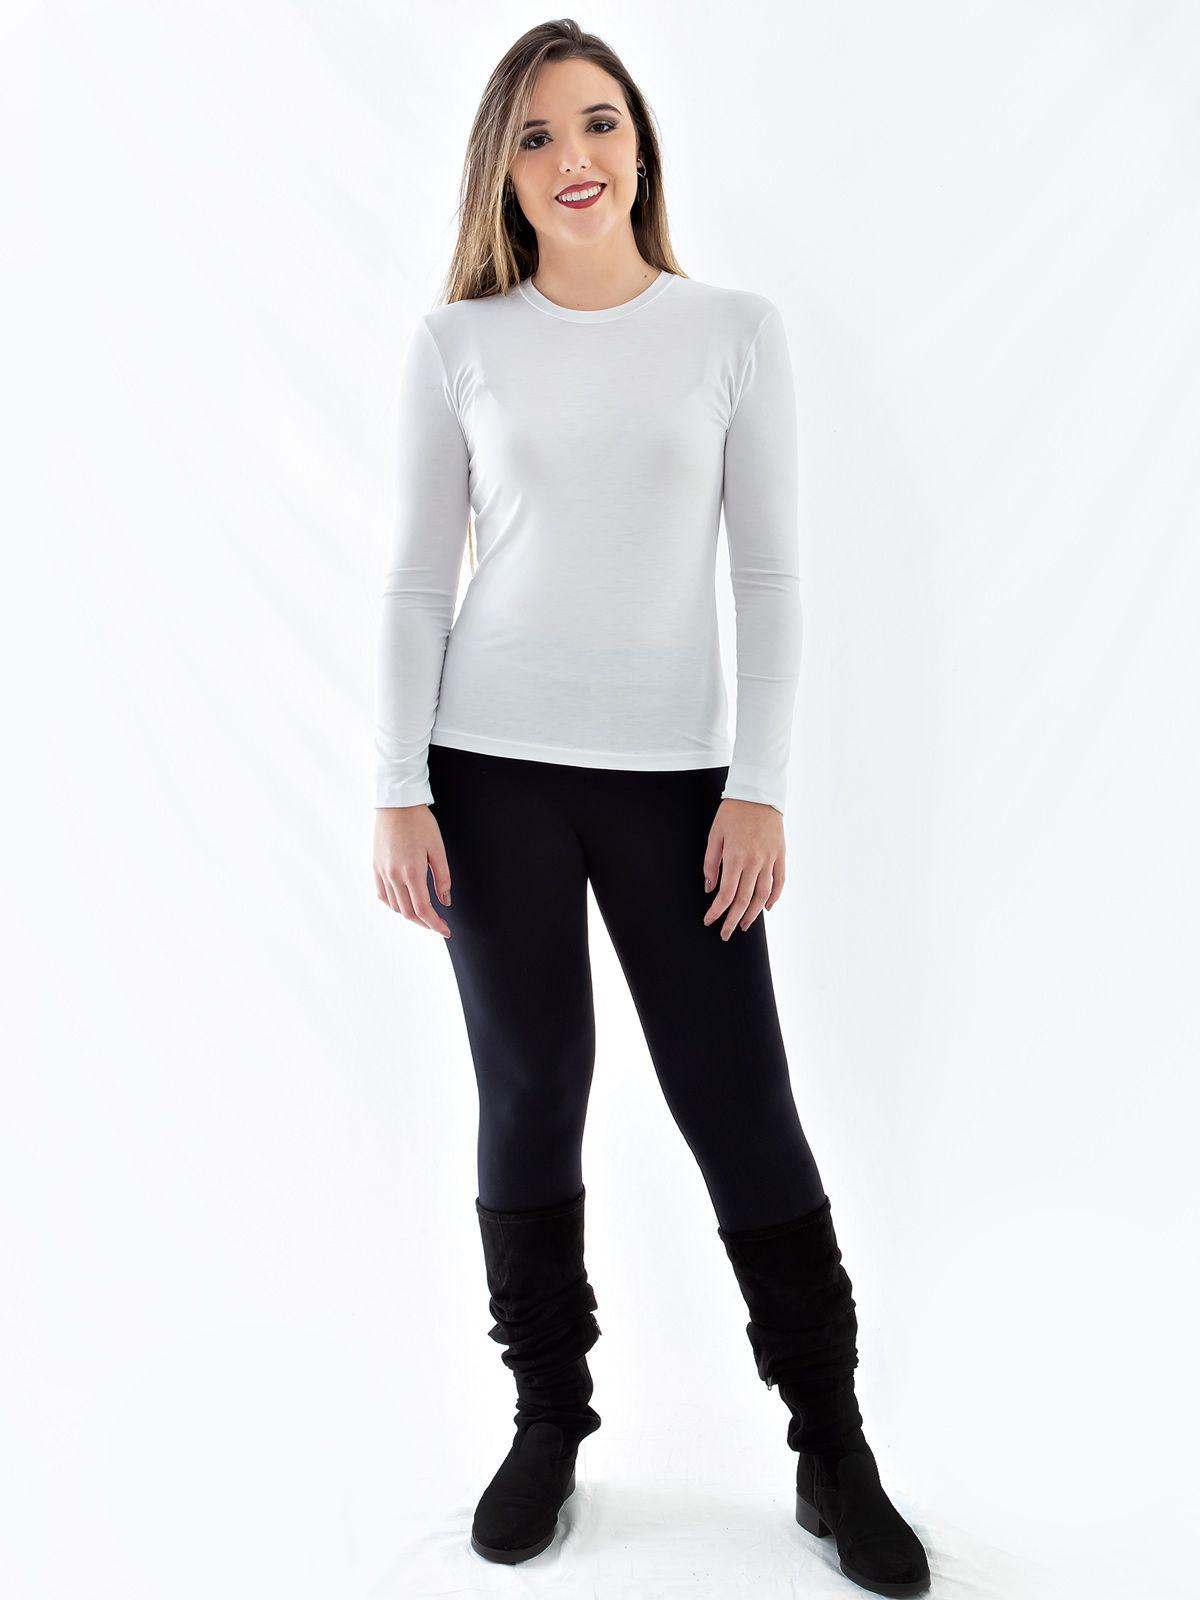 Blusa Feminina de Viscolycra Gola Careca Básica Anistia Branca